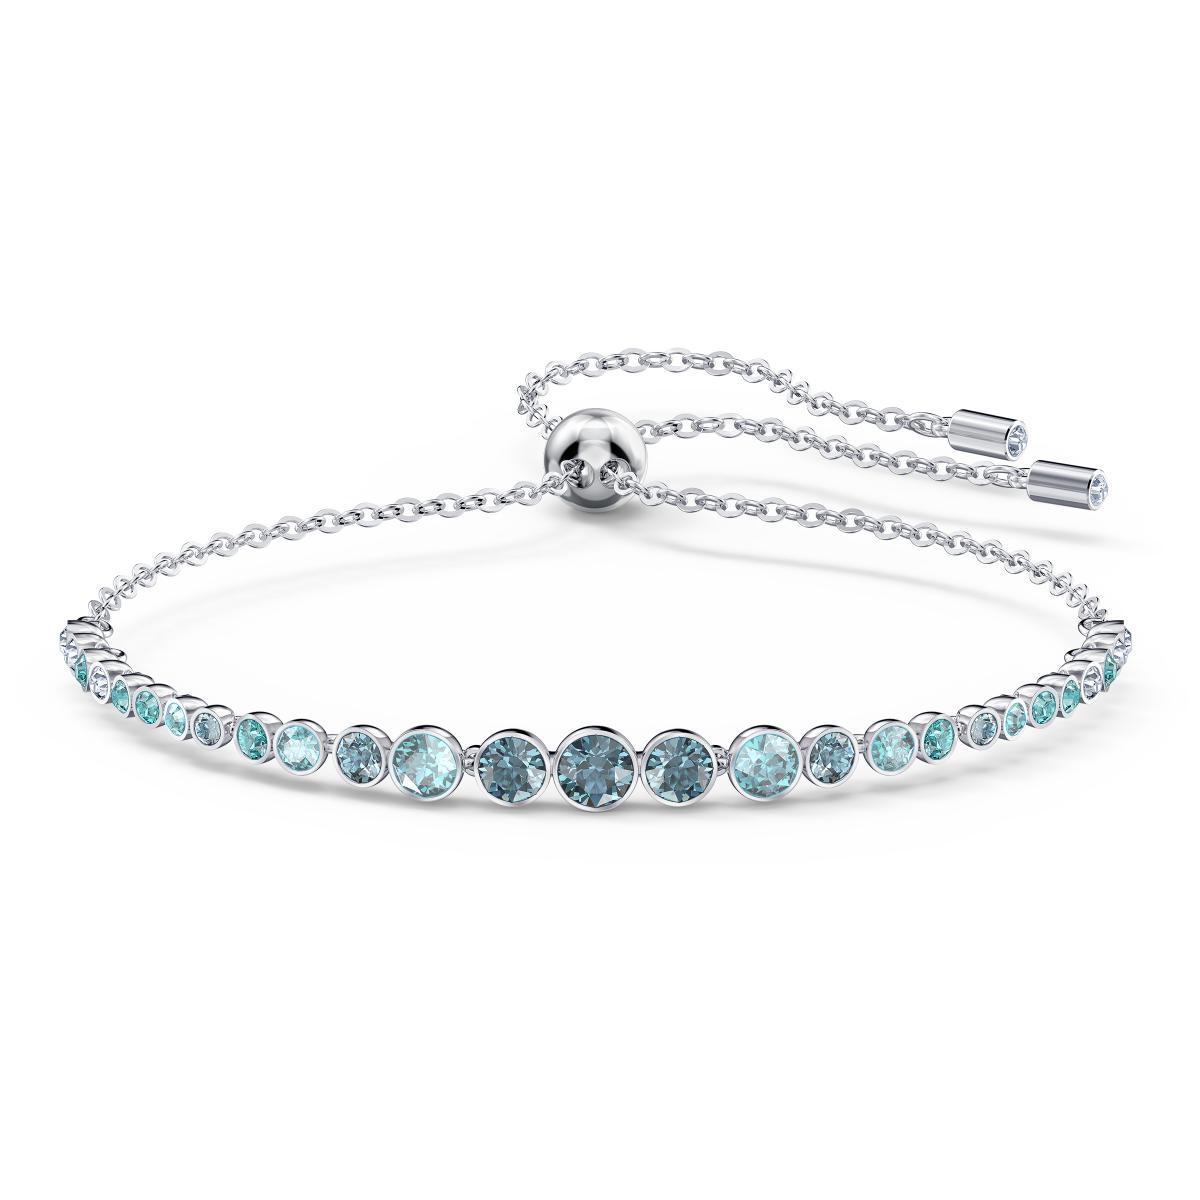 Bracelet Swarovski 5562130 - Bracelet Femme